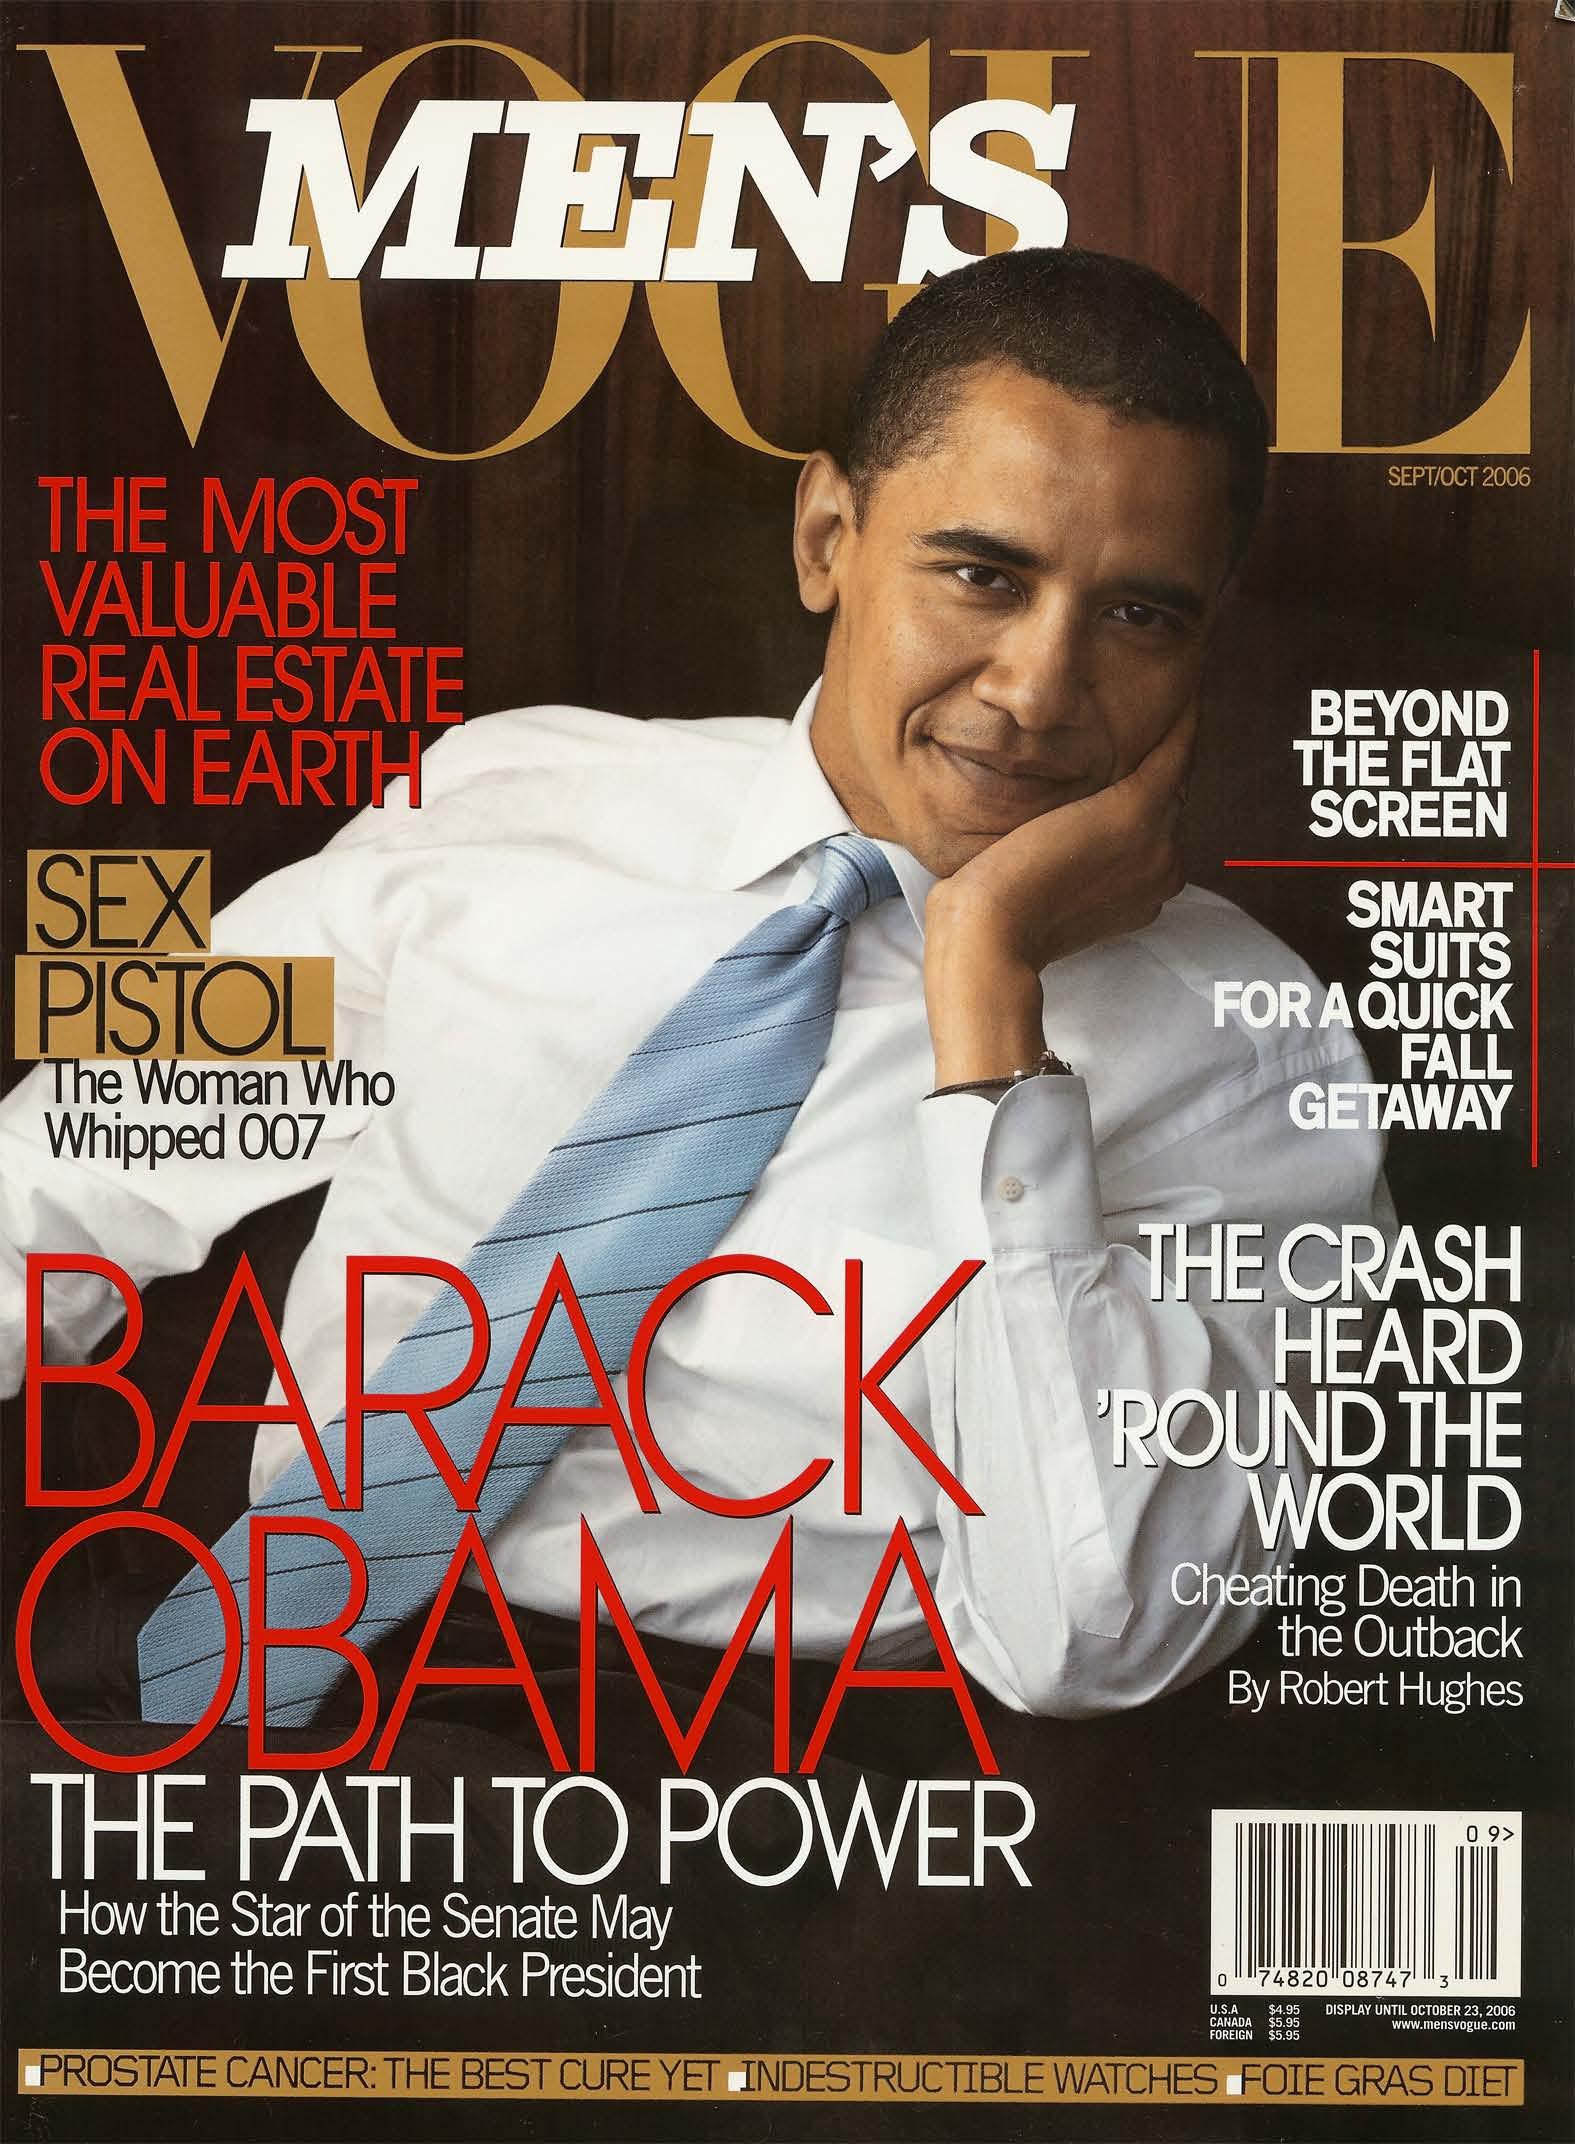 Mens_Vogue_0806_Page_1.jpg